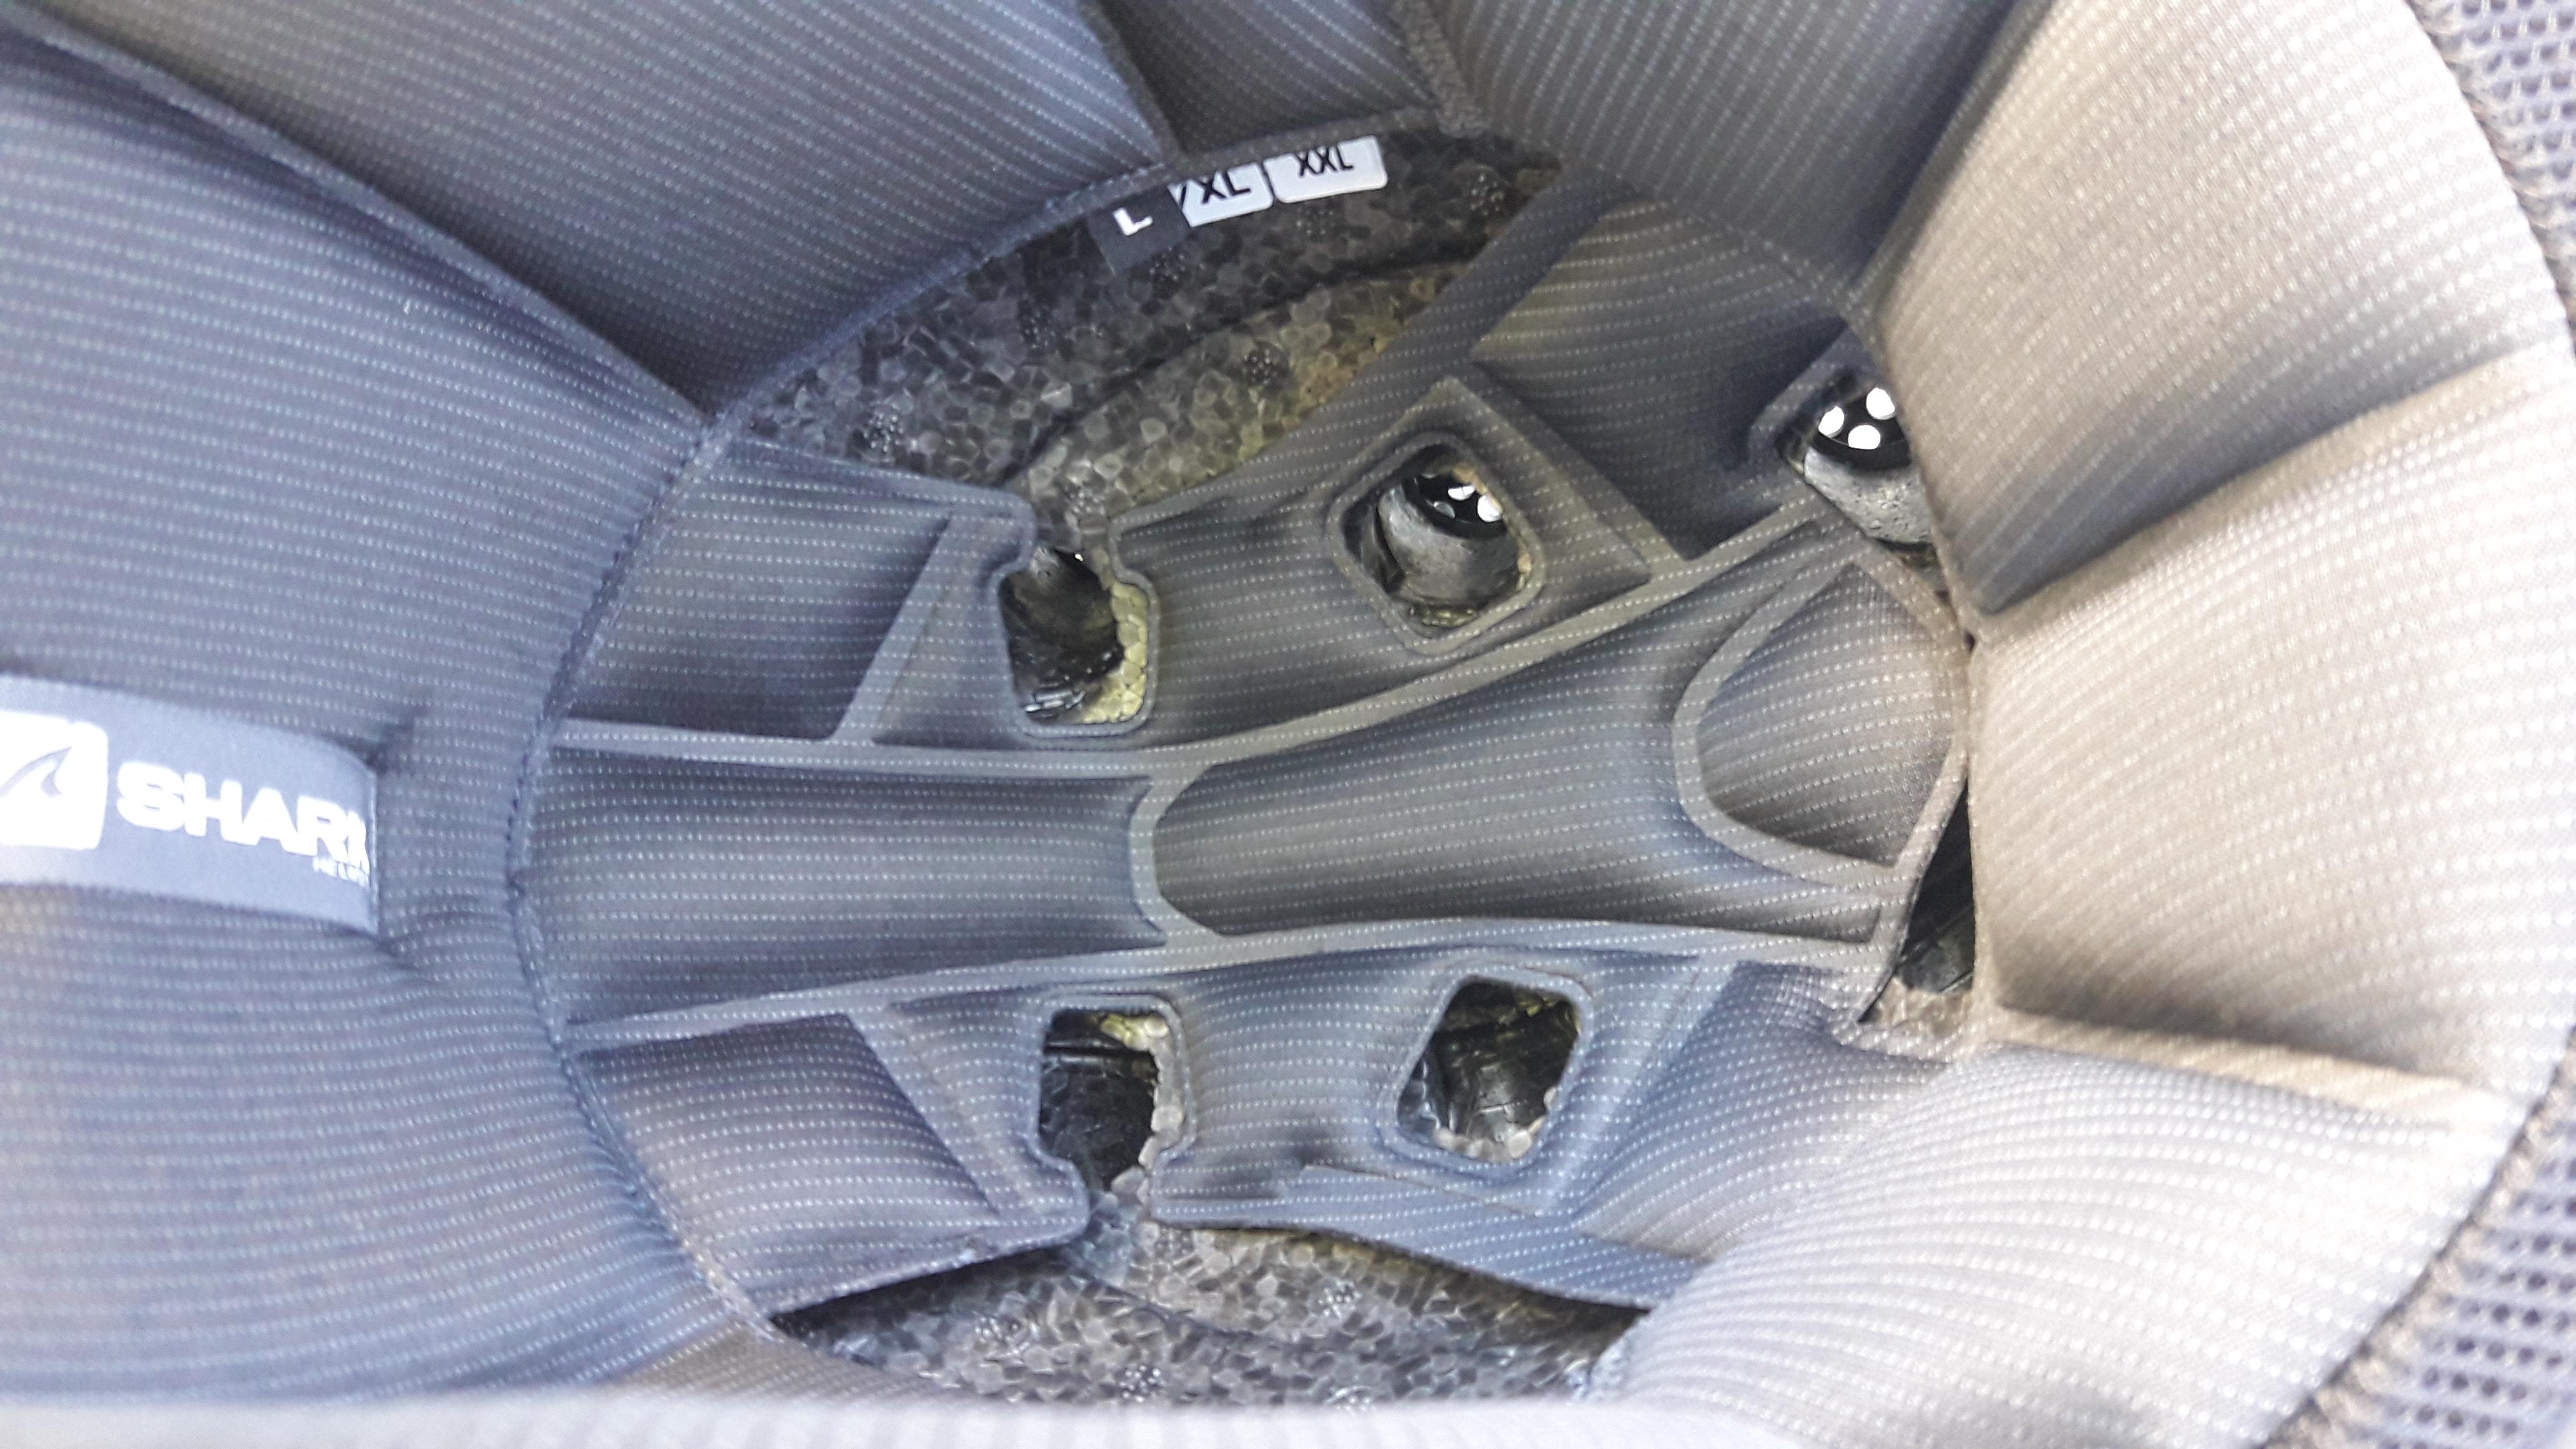 Aérations intérieures du casque jet Shark X-Drak